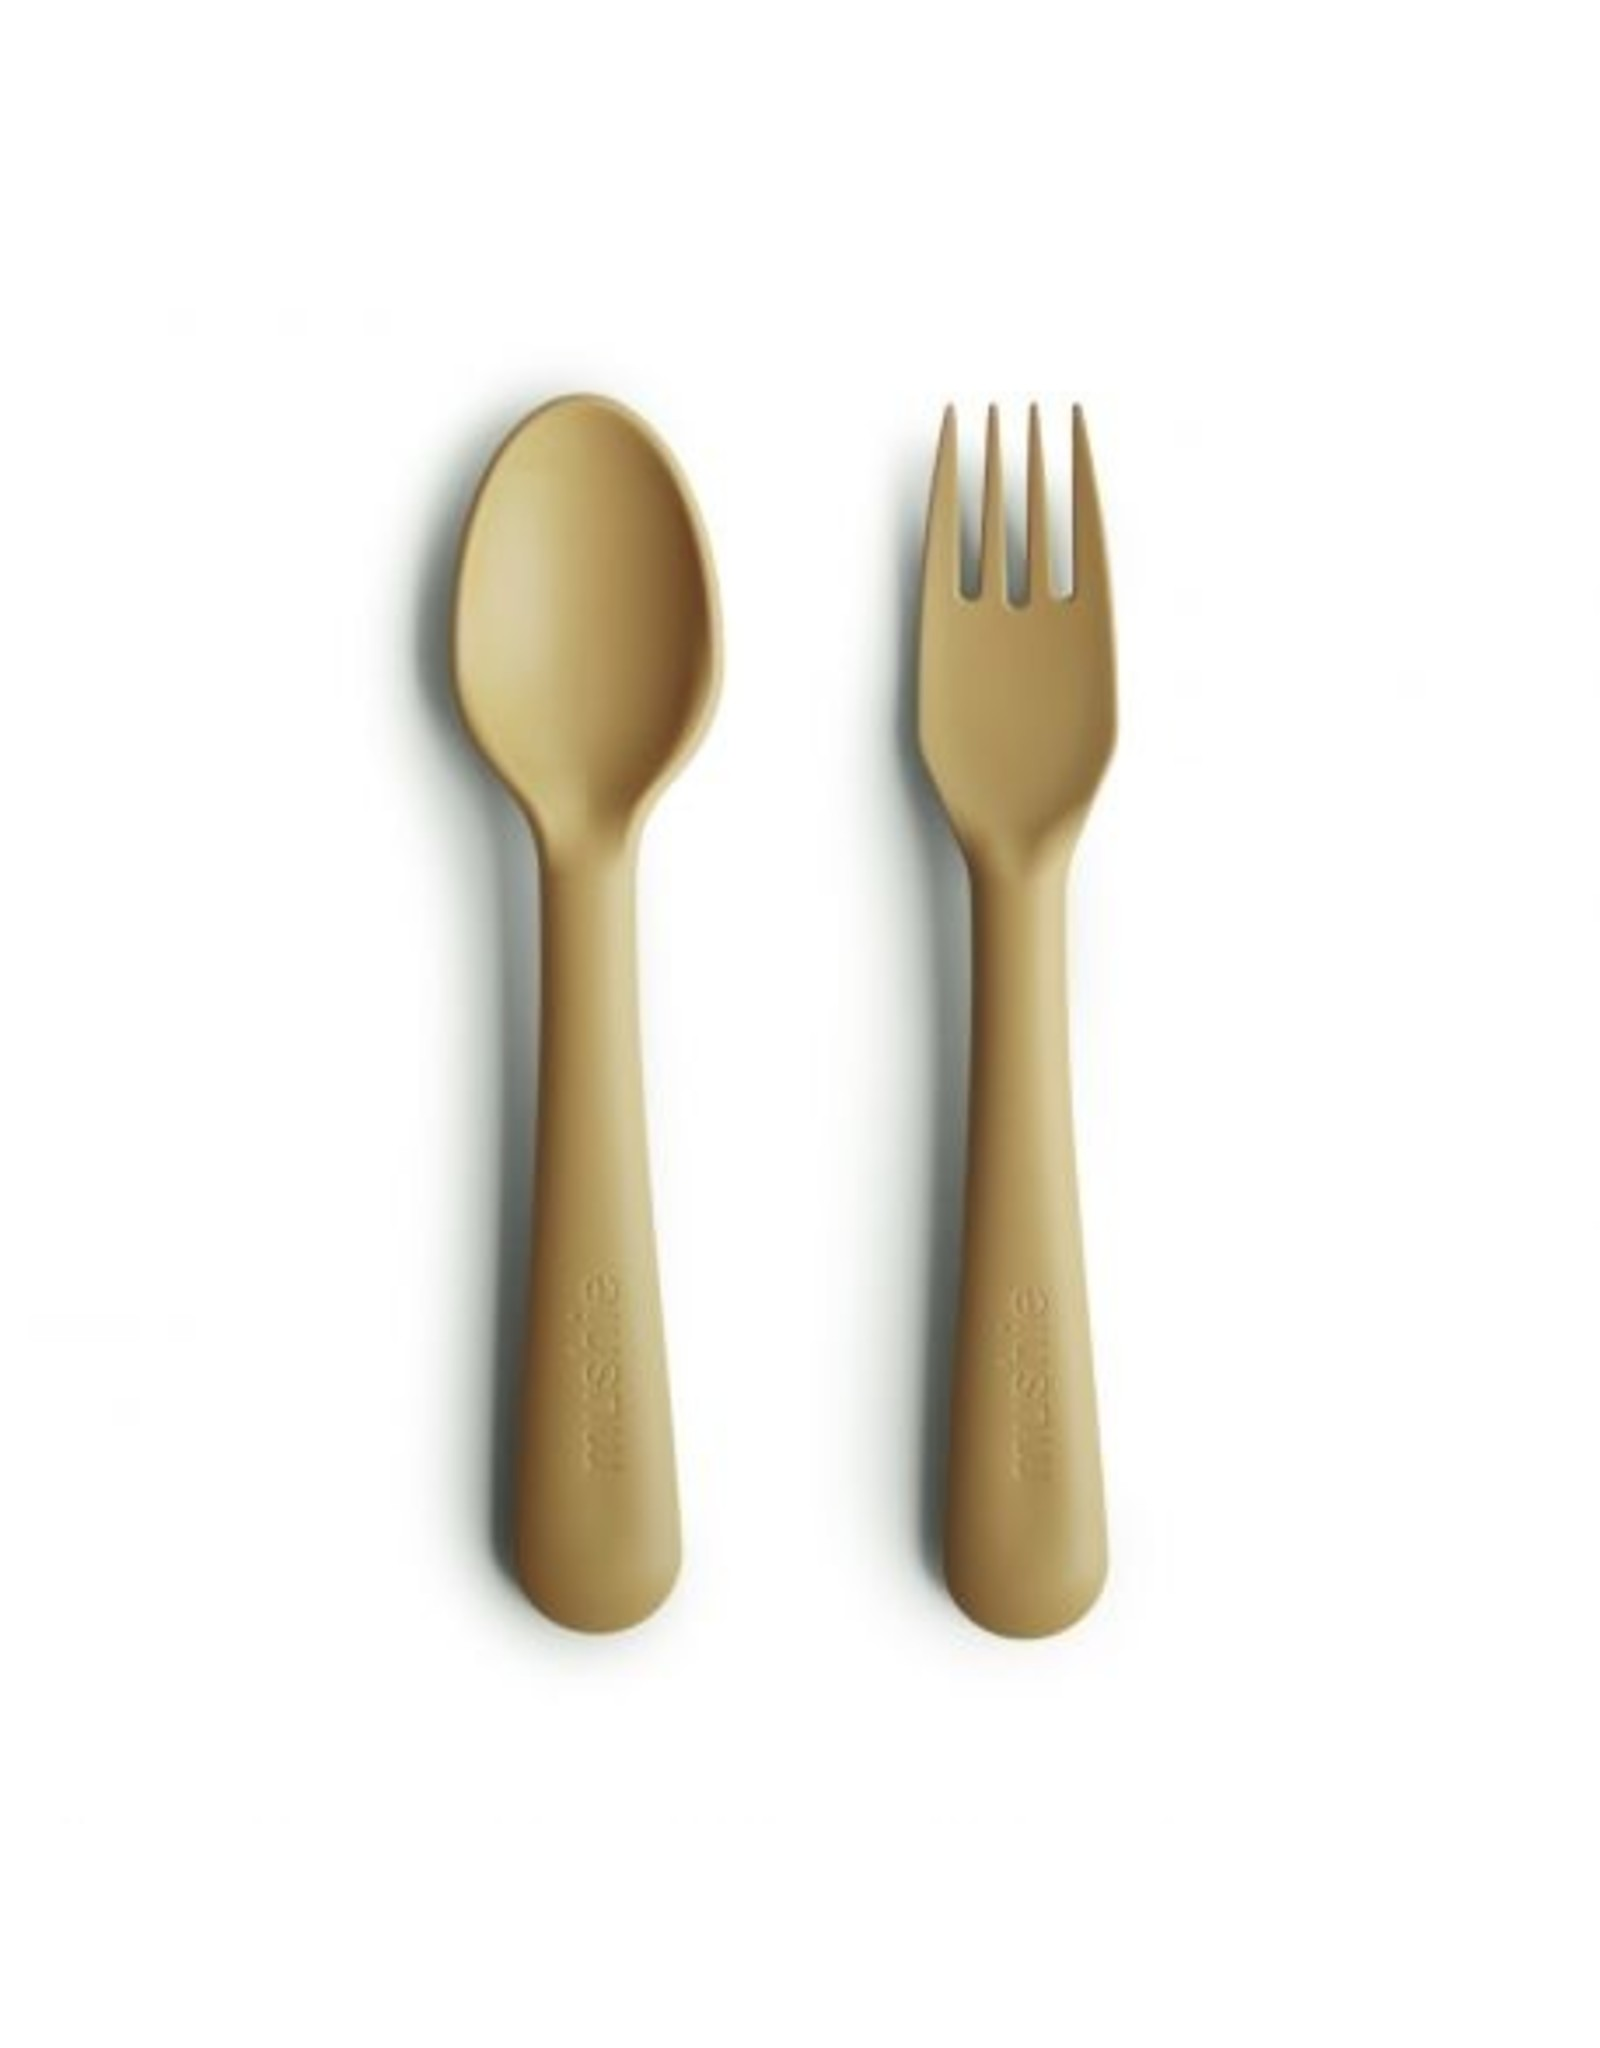 Mushie Fork Spoon Mustard